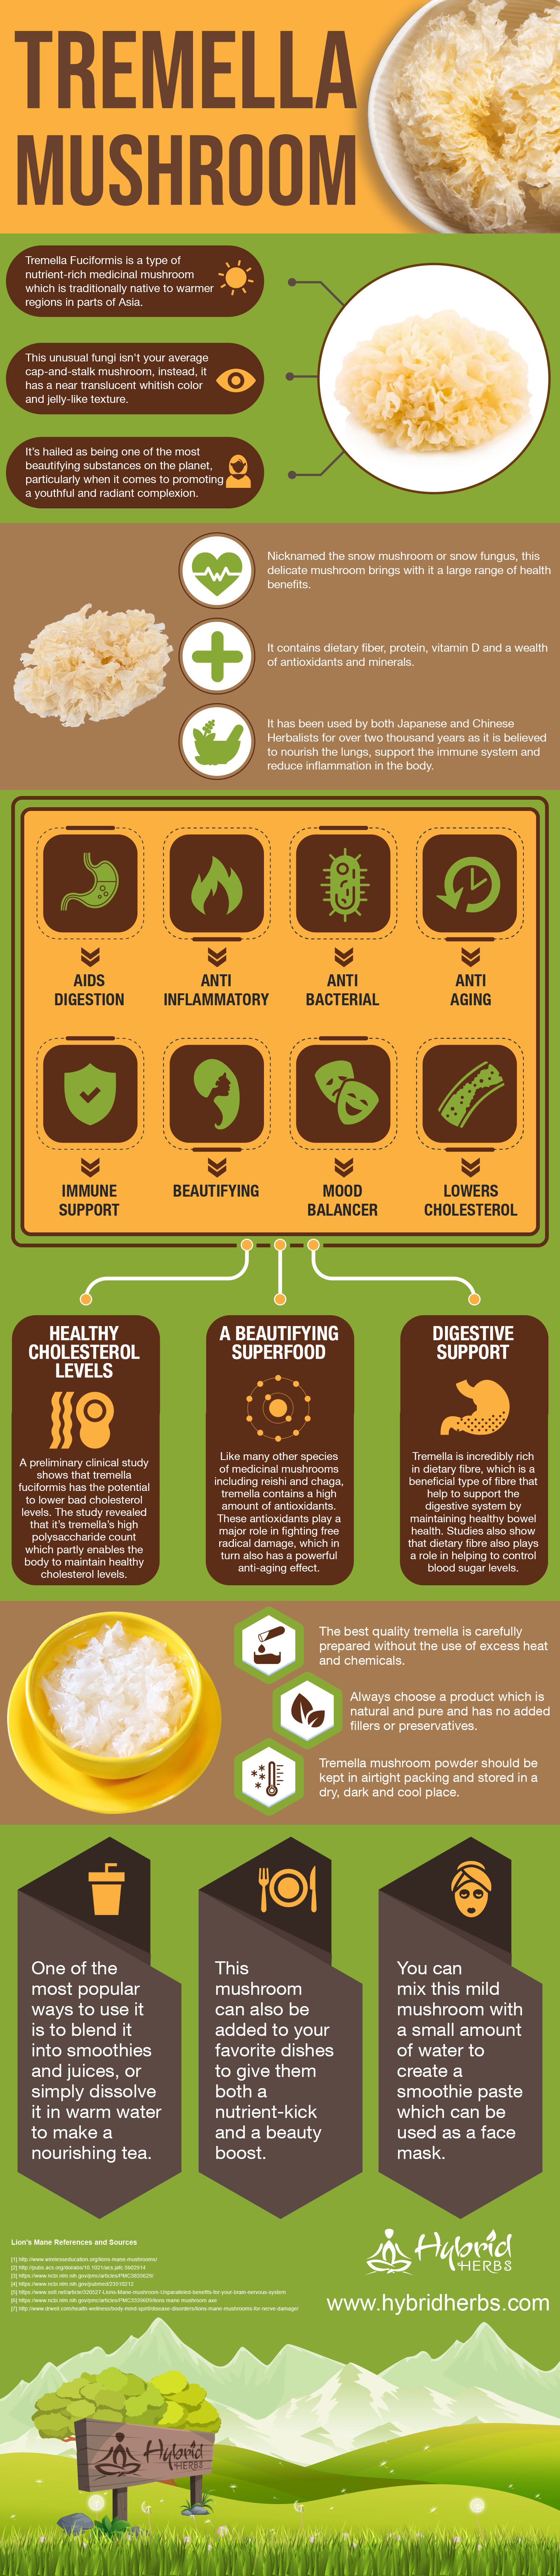 tremella-mushroom-health-benefits.jpg